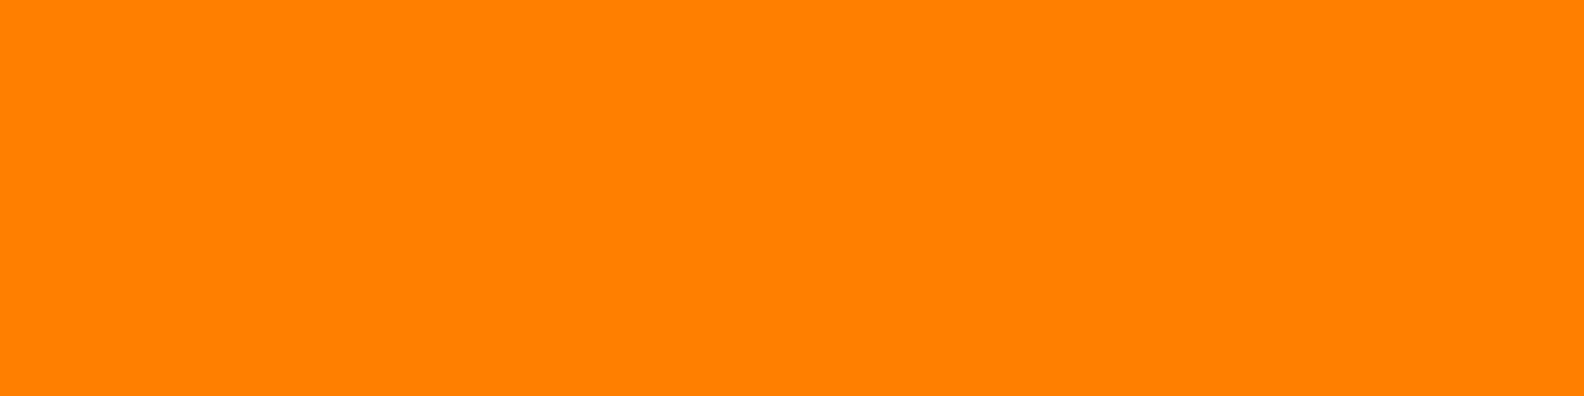 1584x396 Orange Color Wheel Solid Color Background